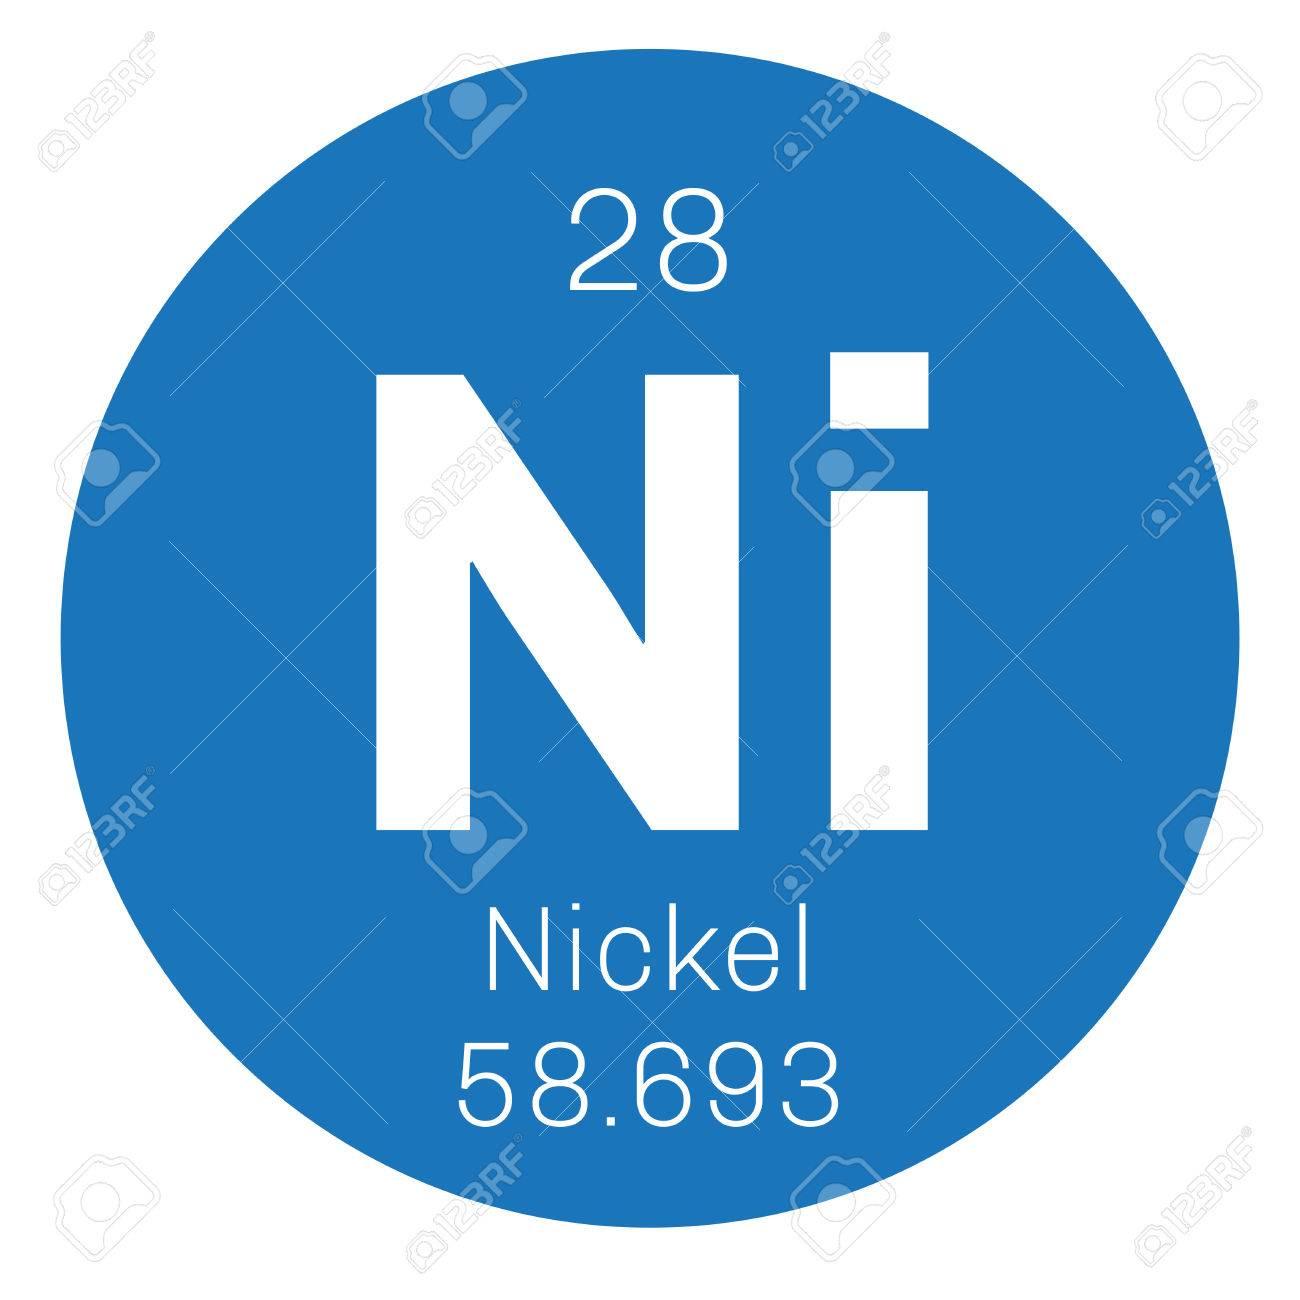 Elemento qumico de nquel metal de transicin icono de color con elemento qumico de nquel metal de transicin icono de color con el nmero atmico urtaz Images